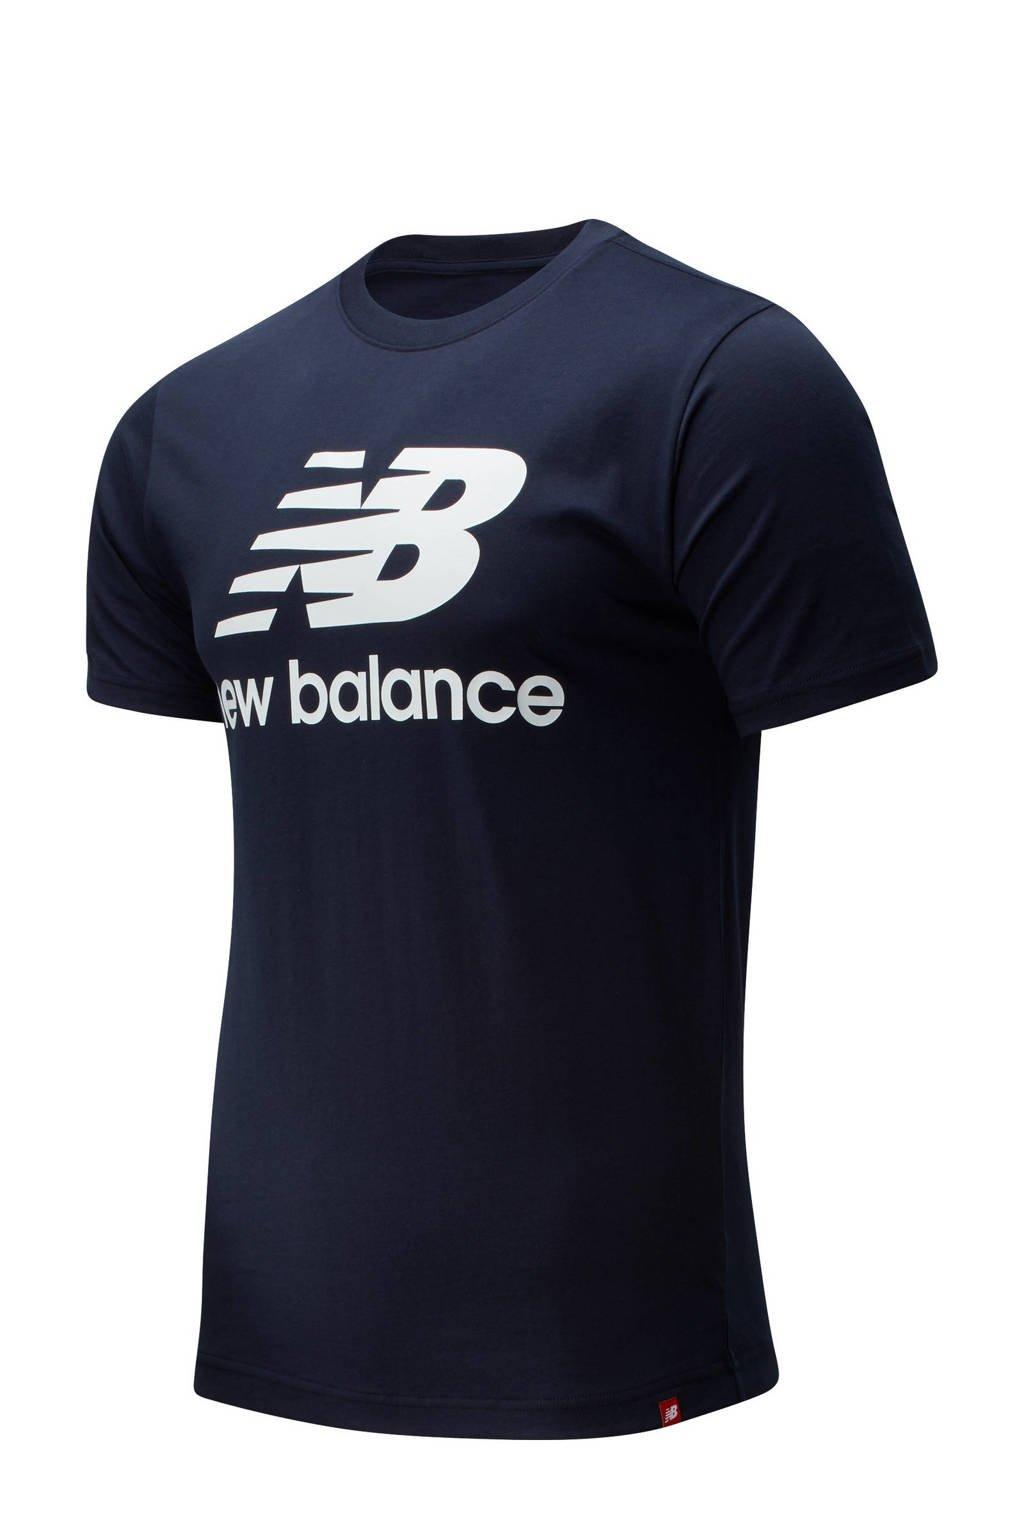 New Balance T-shirt donkerblauw/wit, Donkerblauw/wit